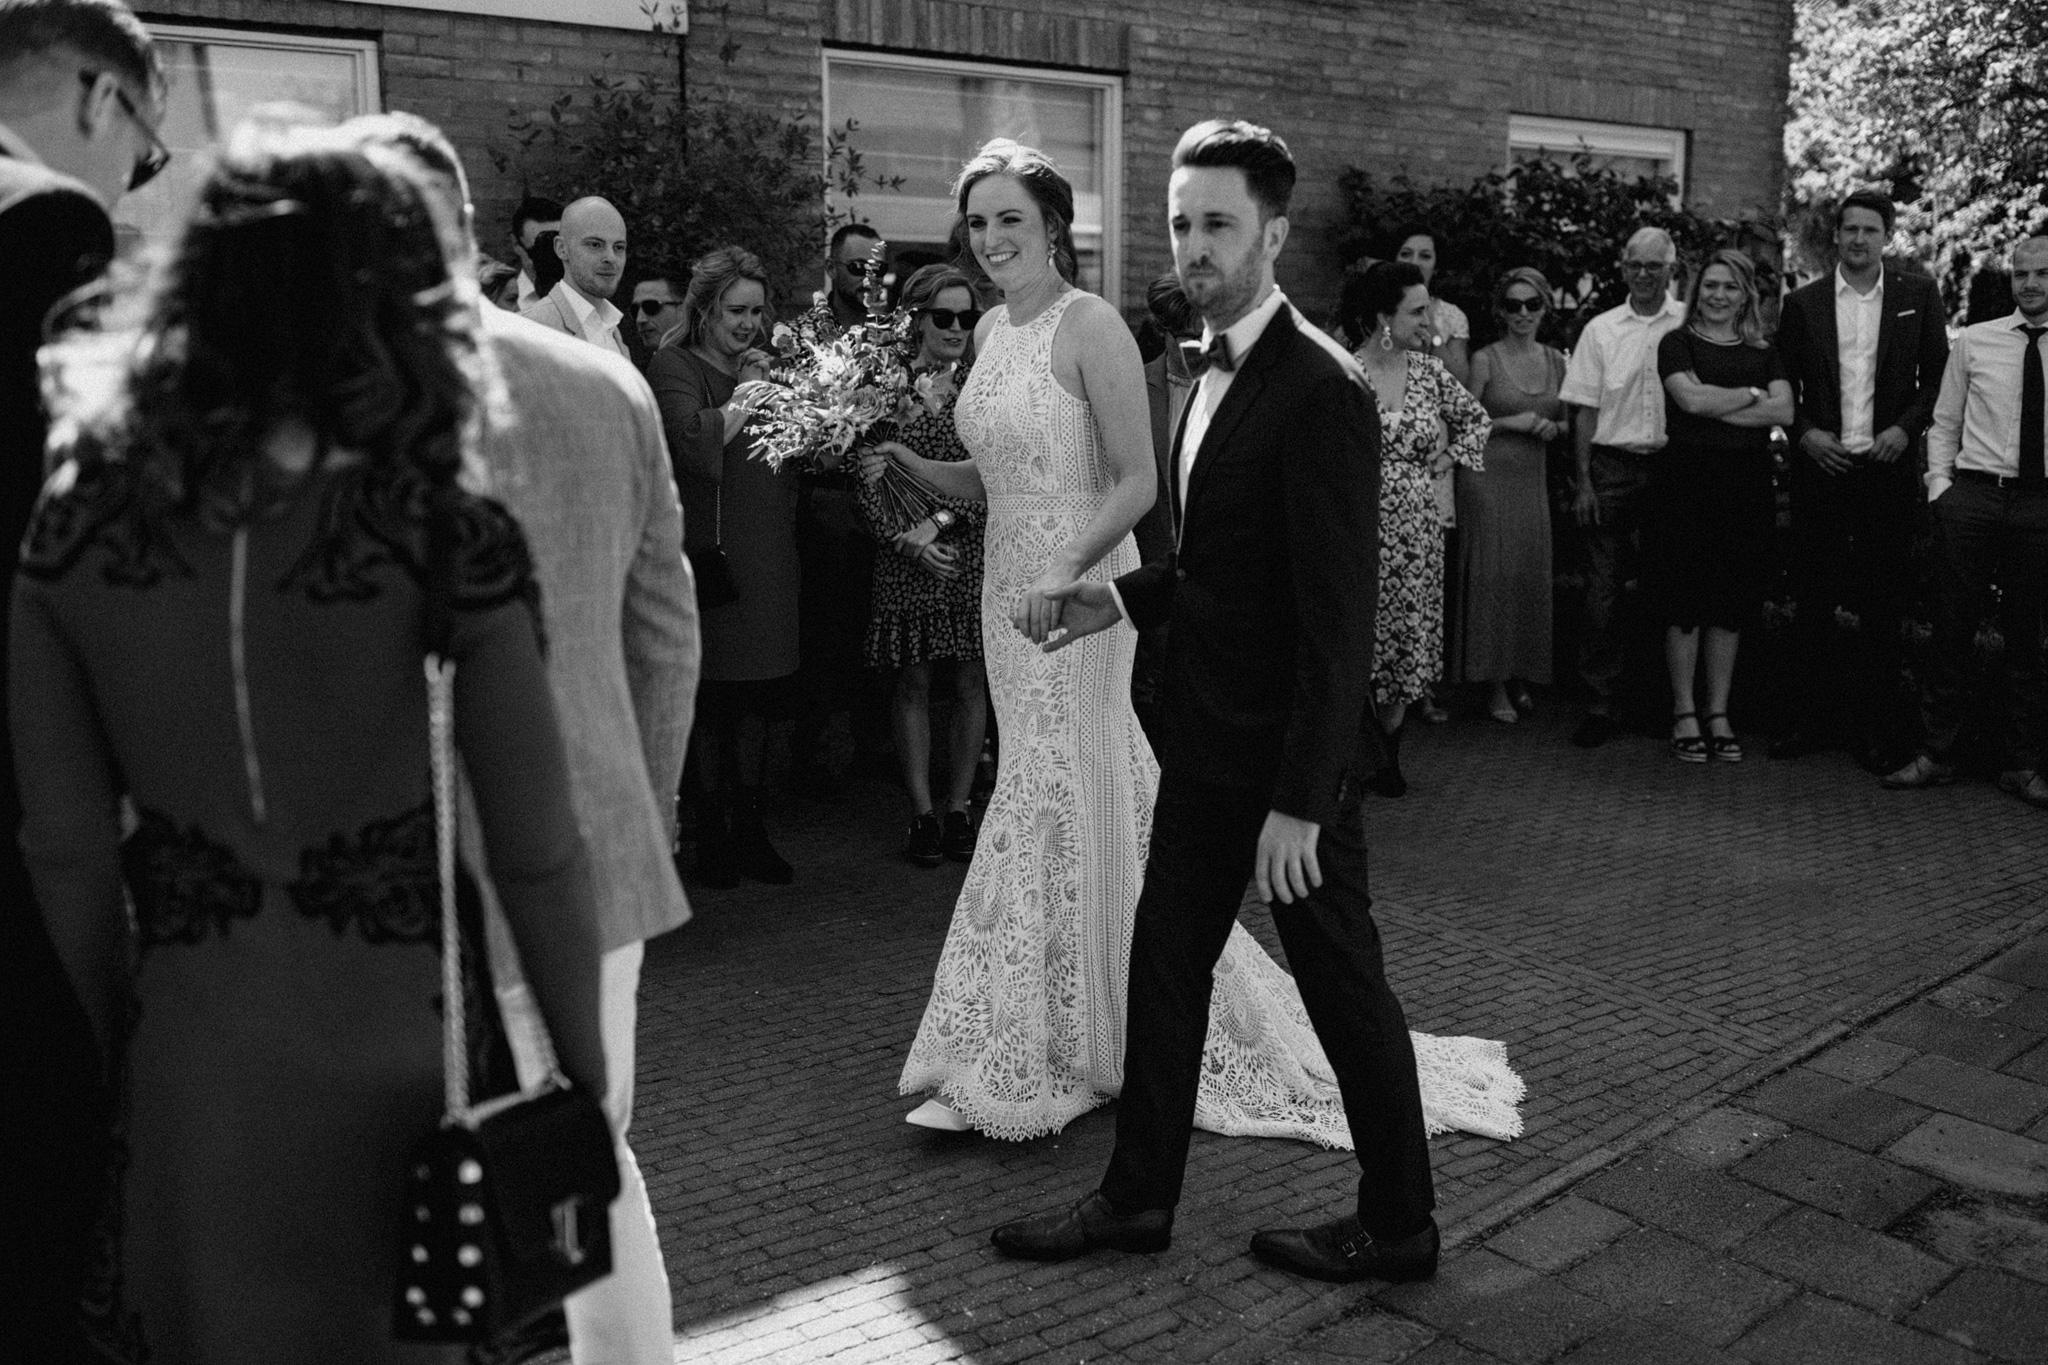 Bruid en bruidegom arriveren bij huis ouders bruidegom